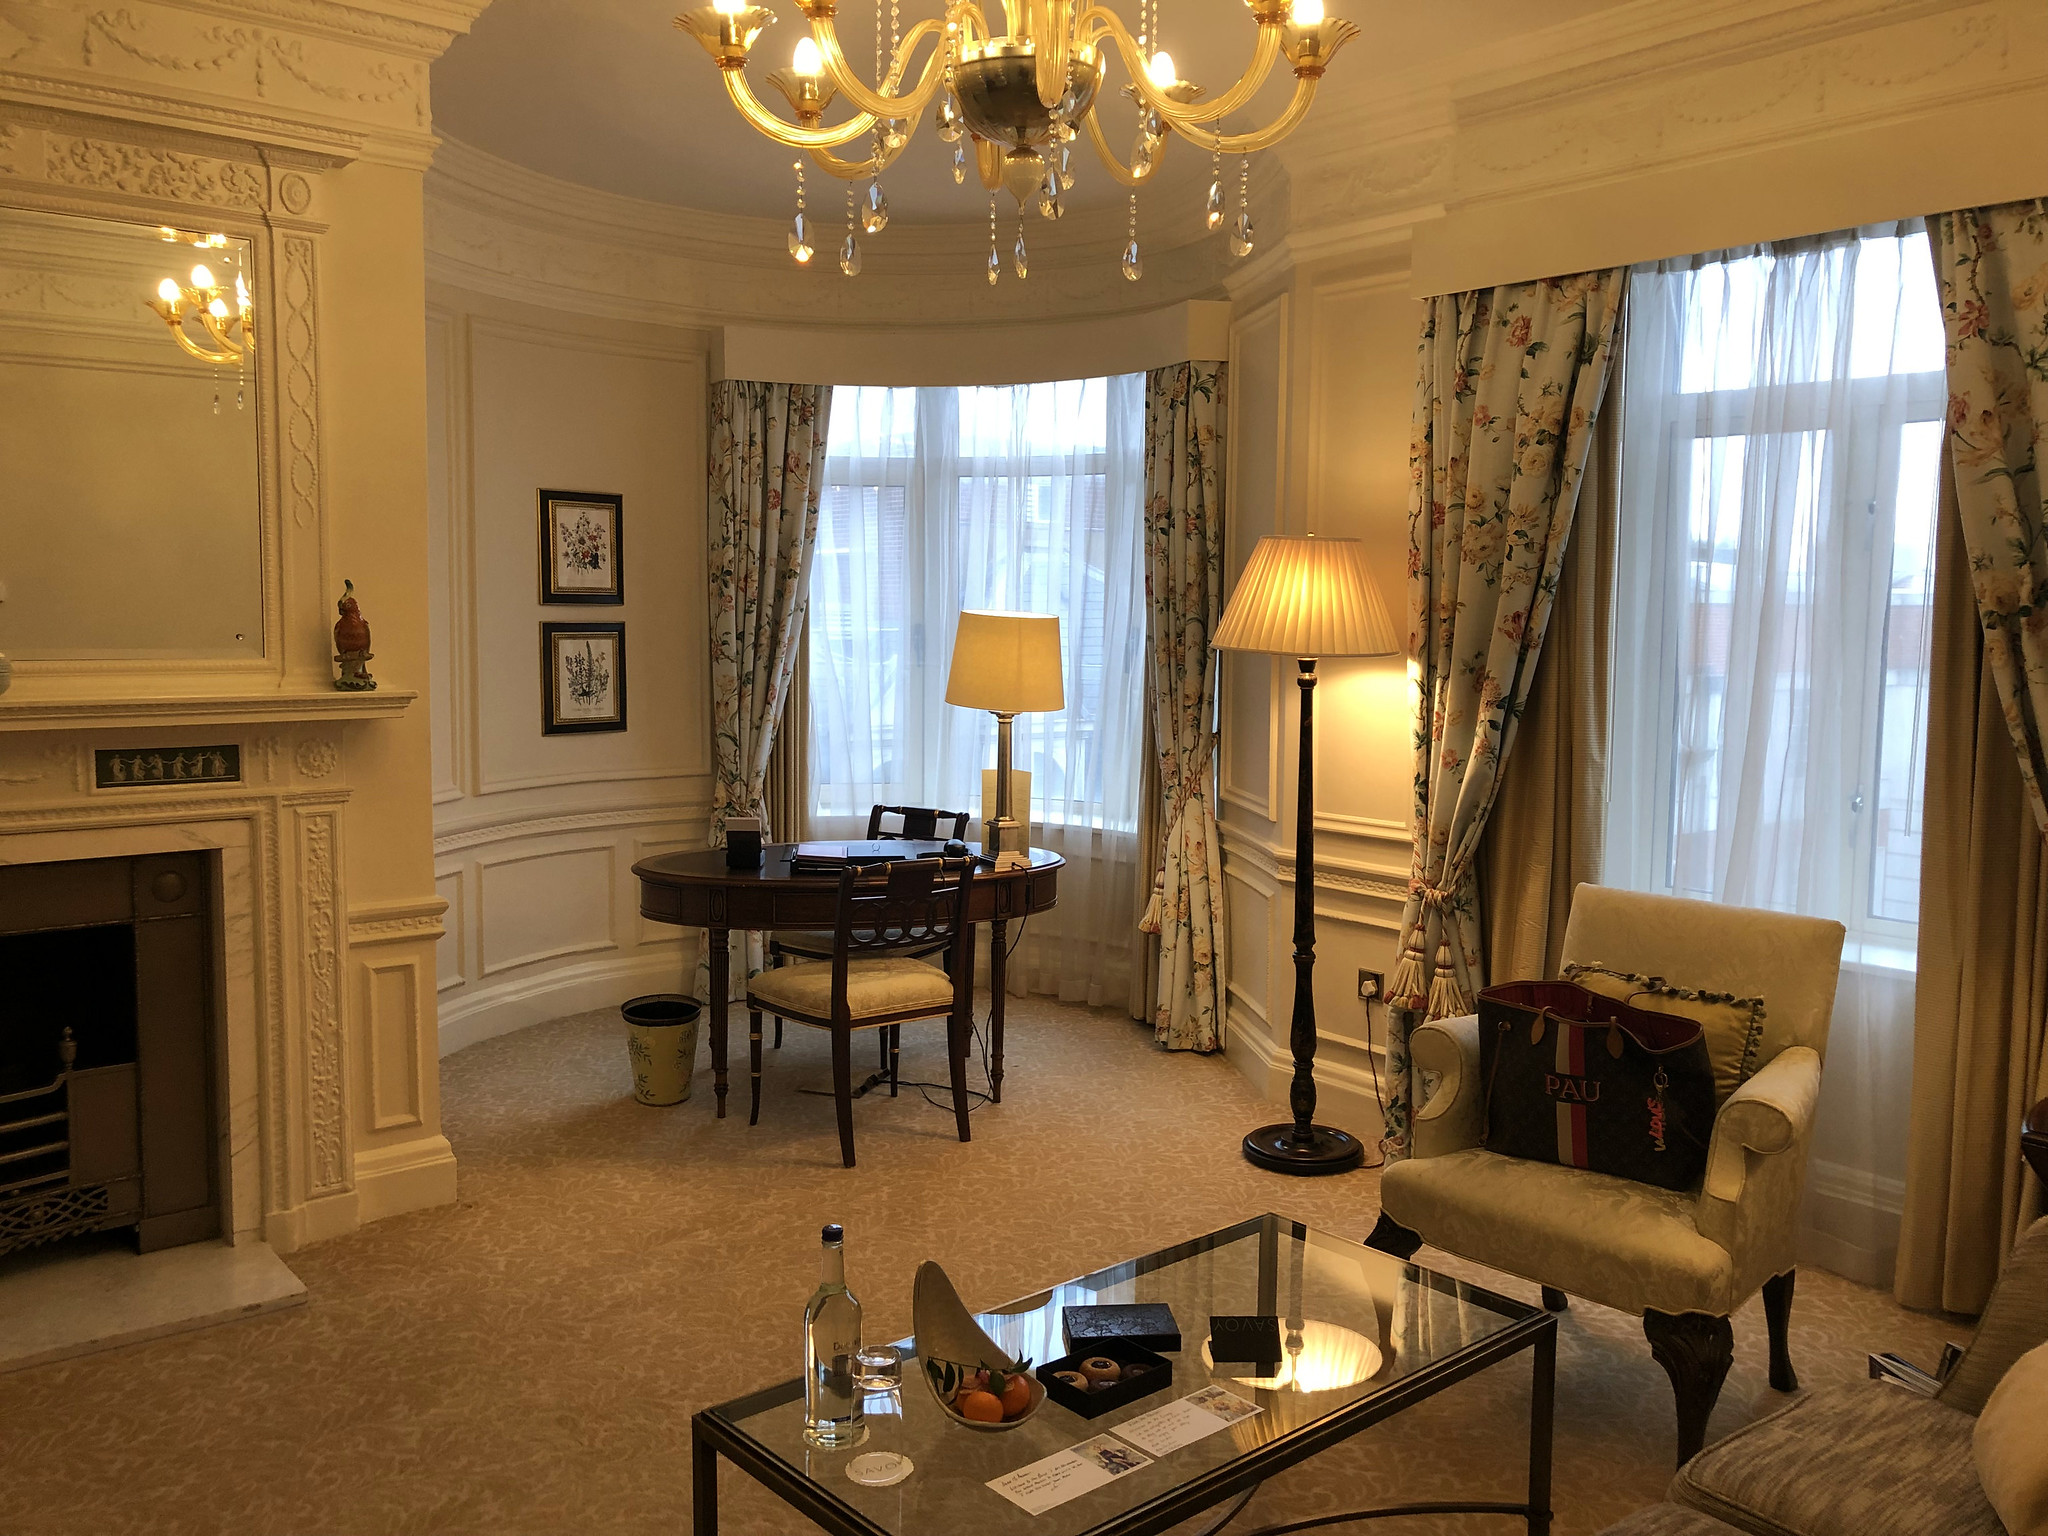 Hotel Savoy de Londres - The Savoy London - Thewotme hotel savoy de londres - 50939794823 0129c8da67 k - El histórico Hotel Savoy de Londres